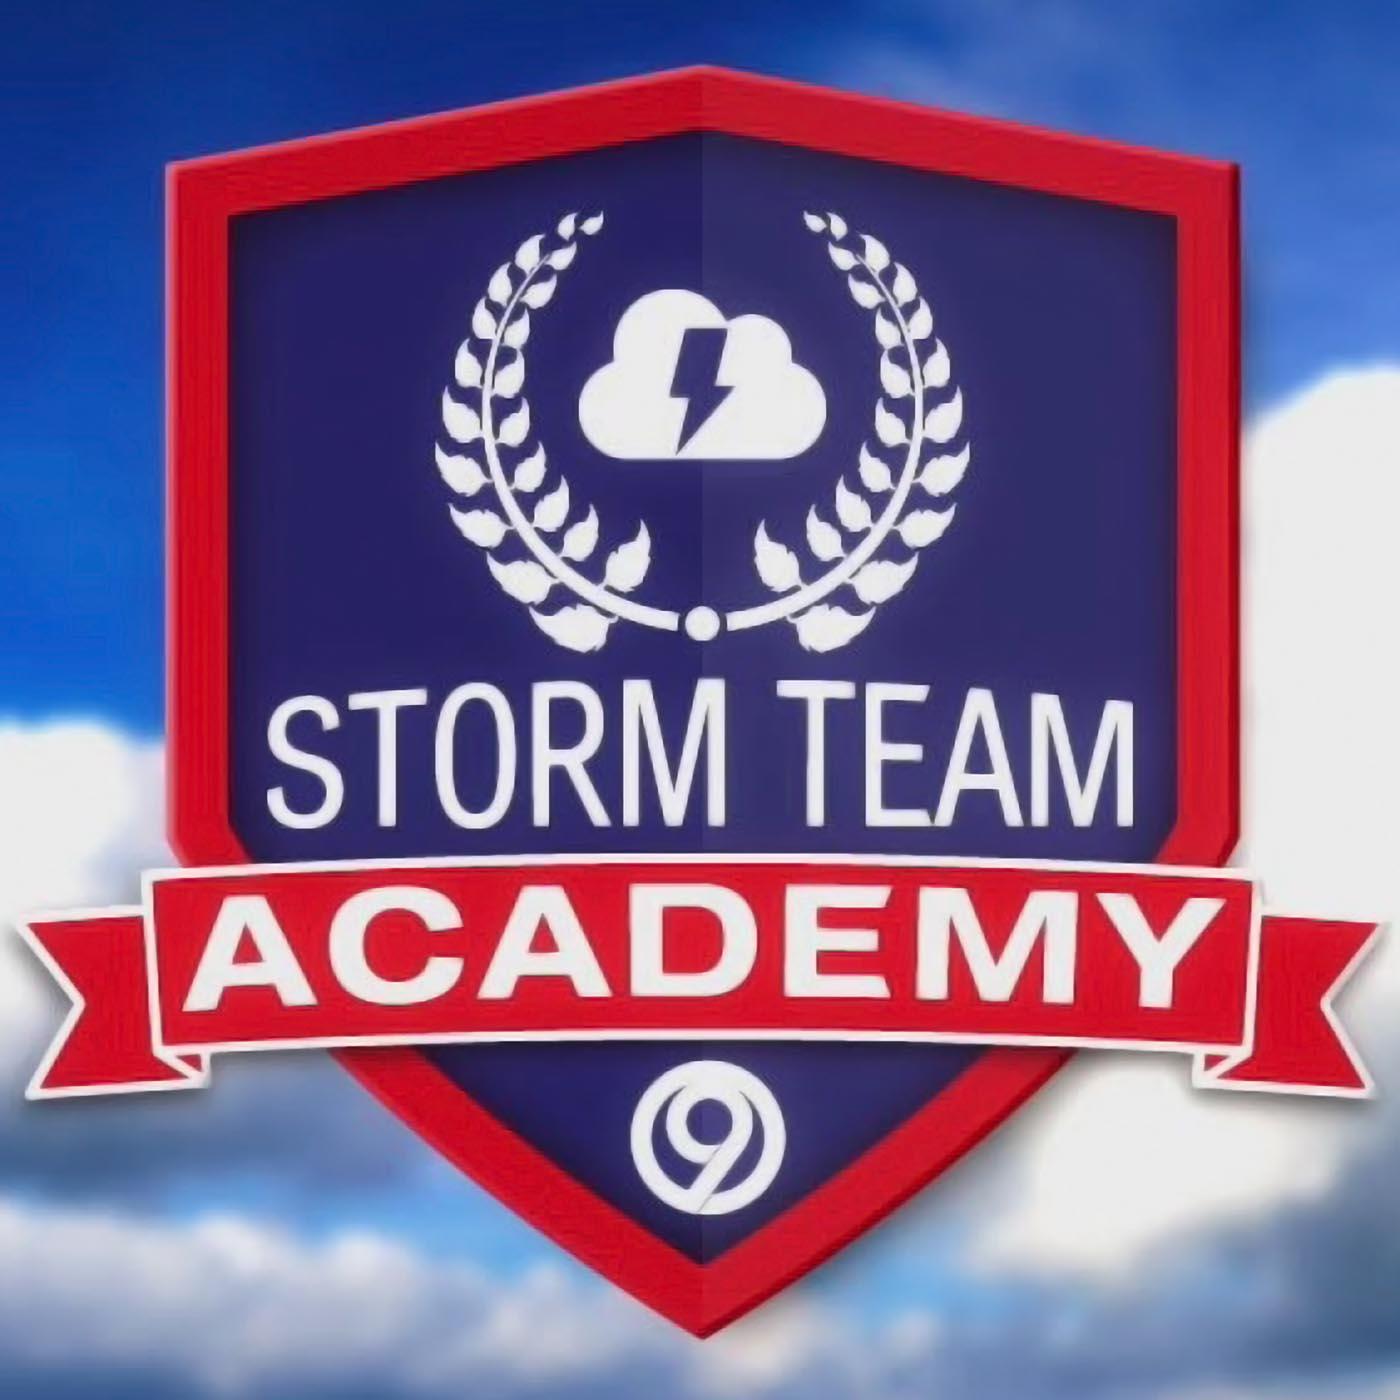 Storm Team Academy logo